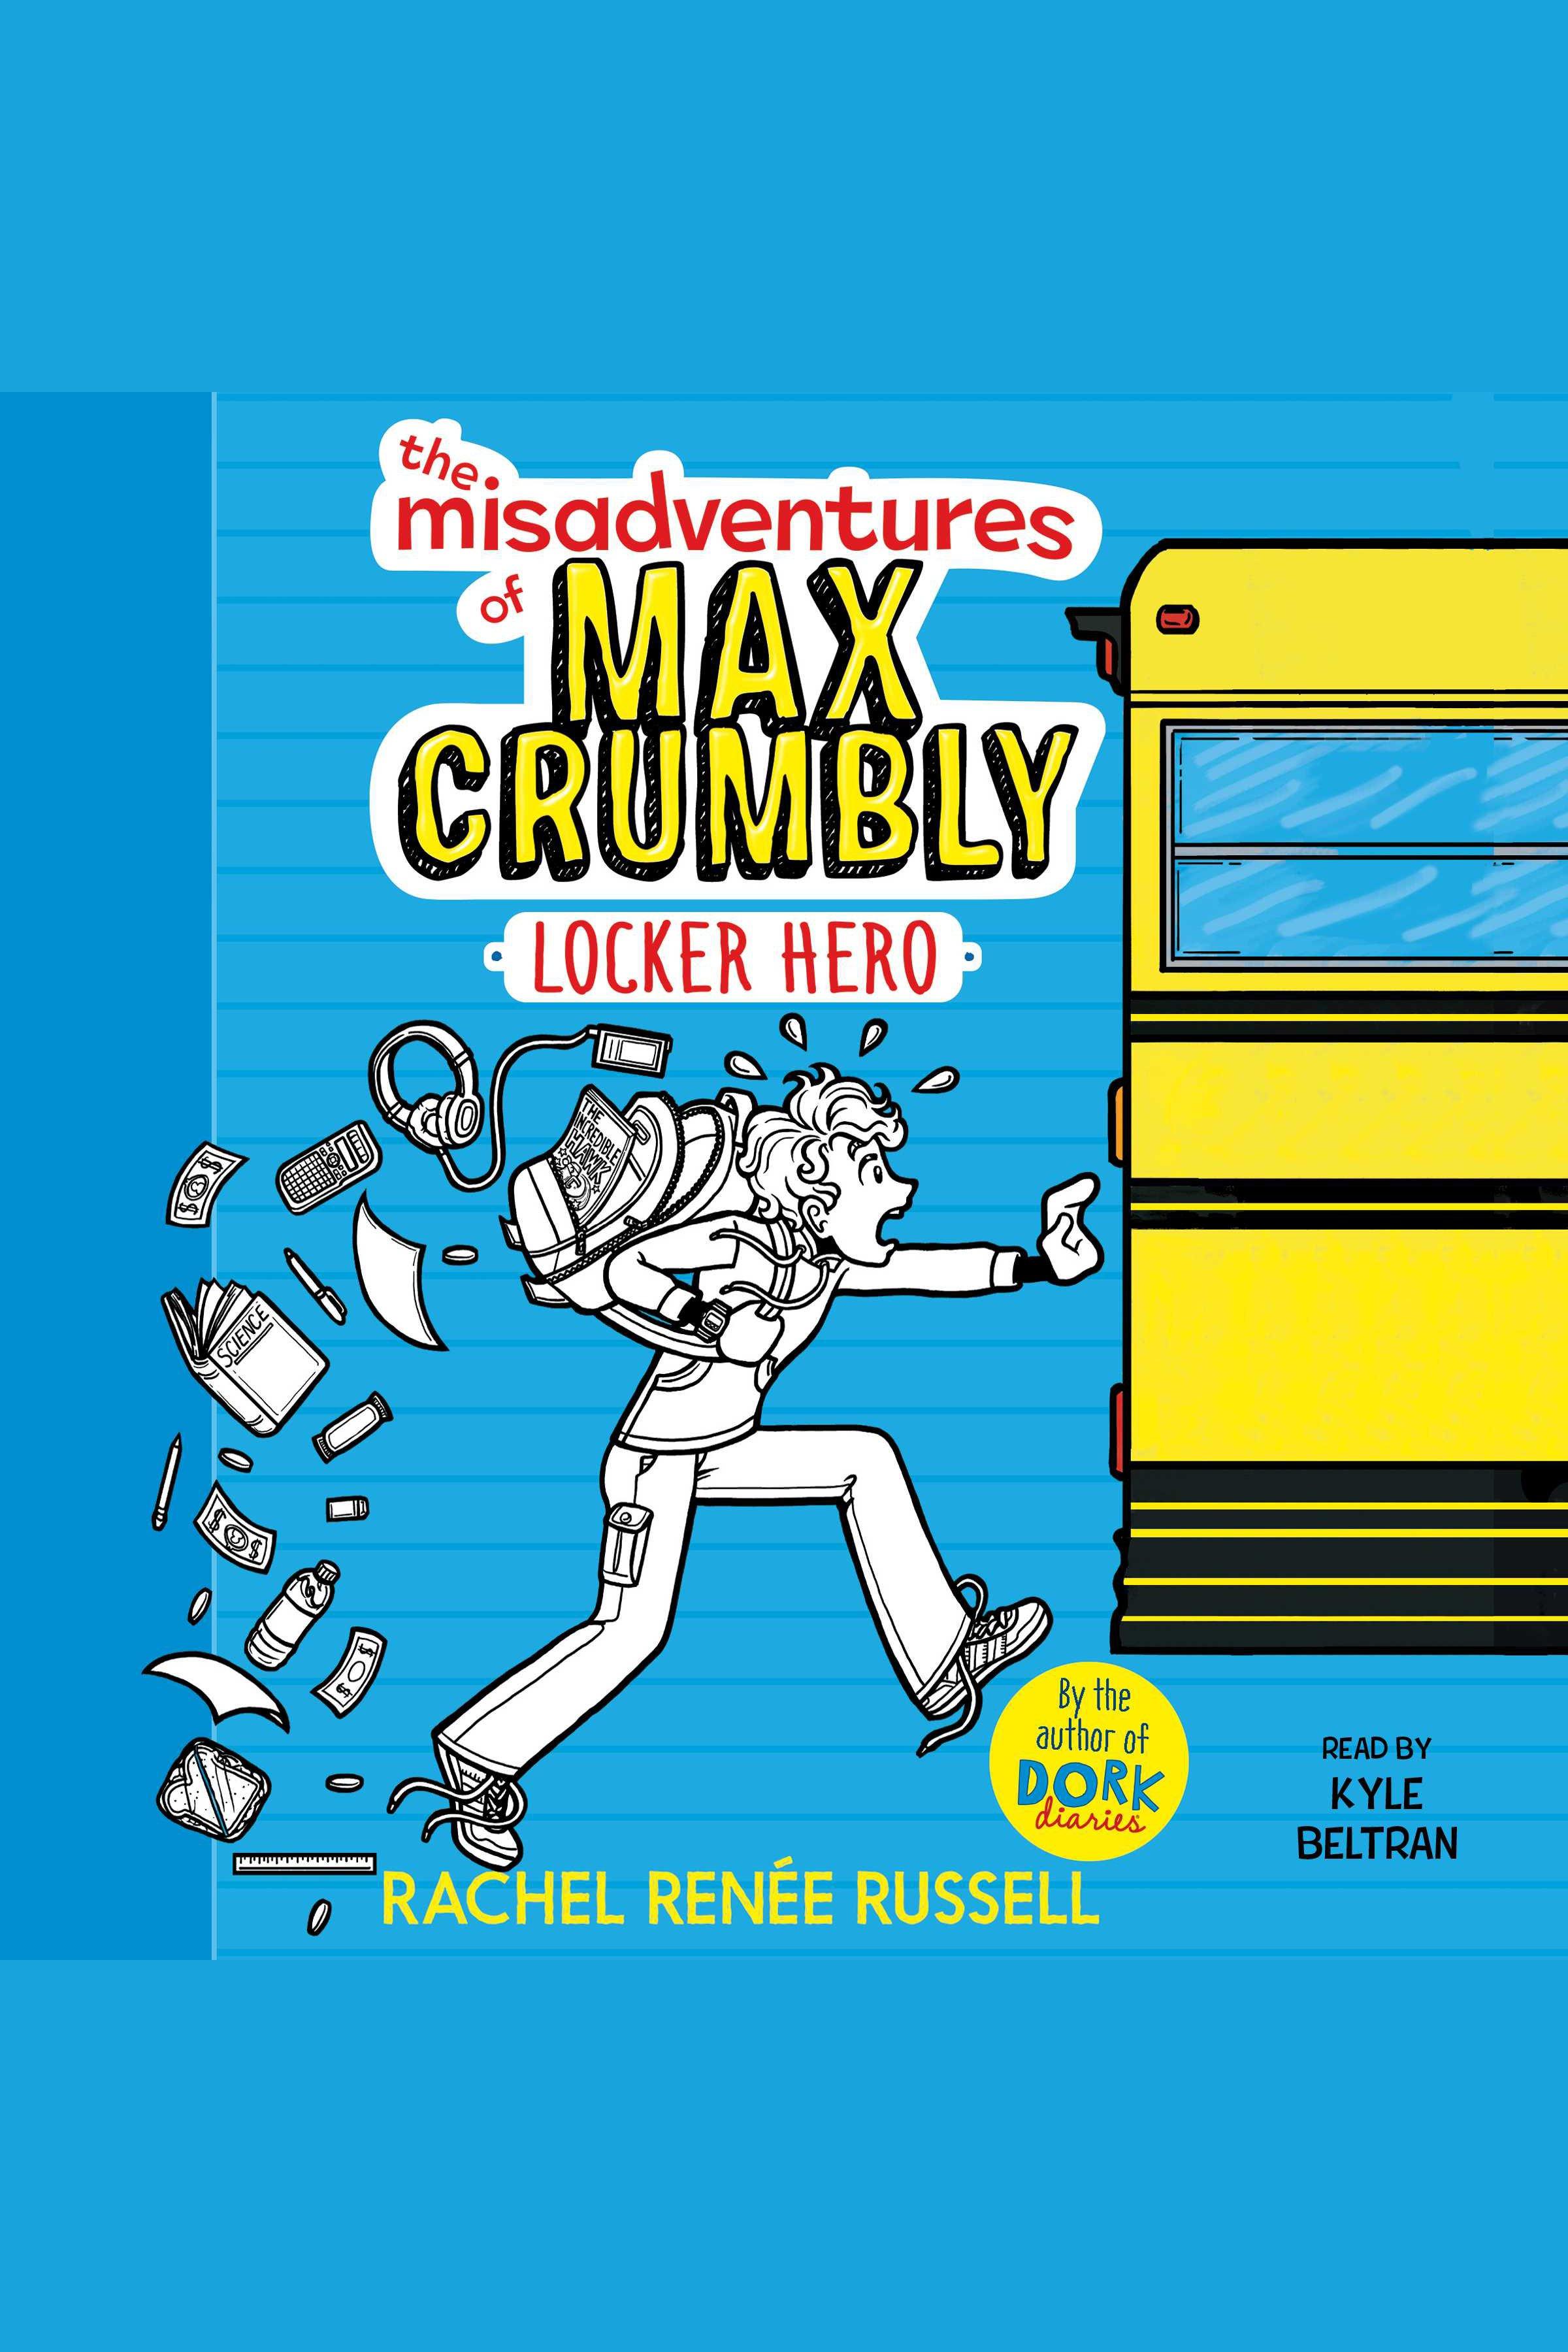 The Misadventures of Max Crumbly 1 Locker Hero